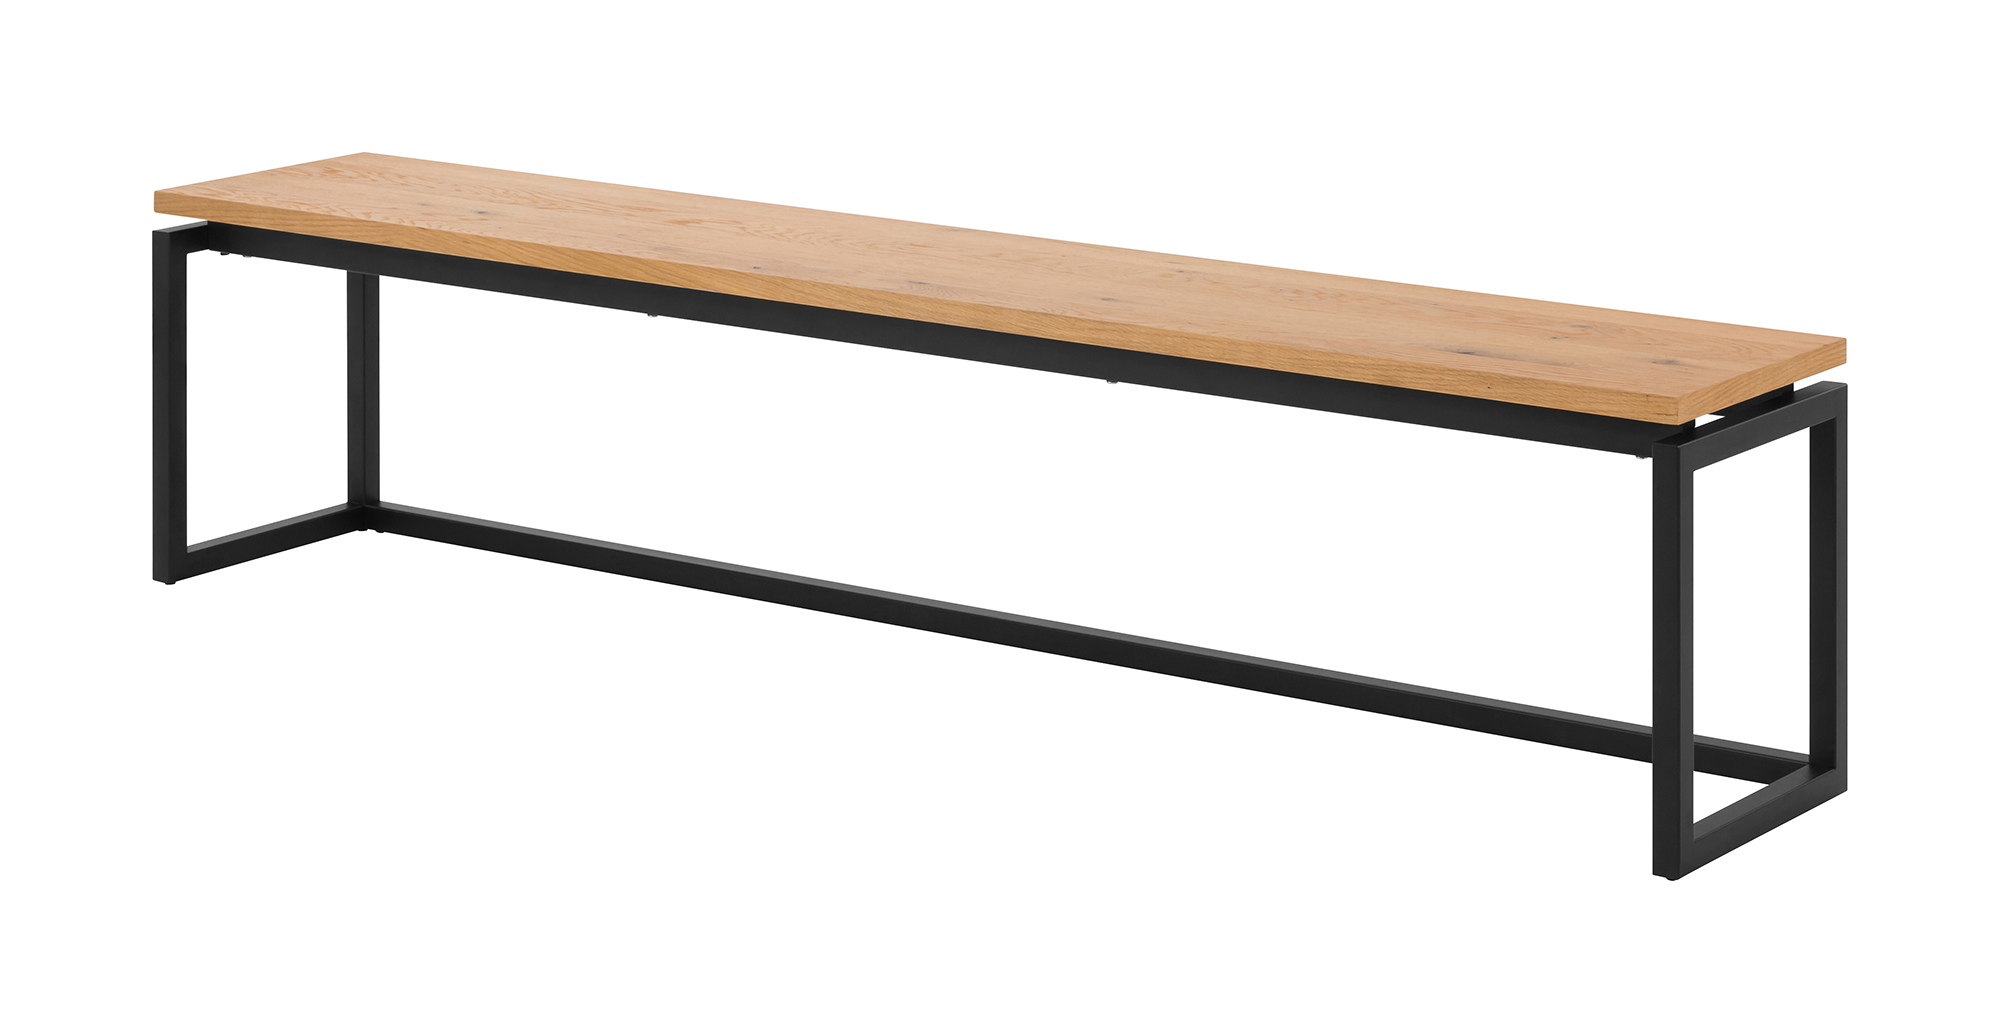 Dalarna bænk - natur/sort vildegfinér/metal (160x35)